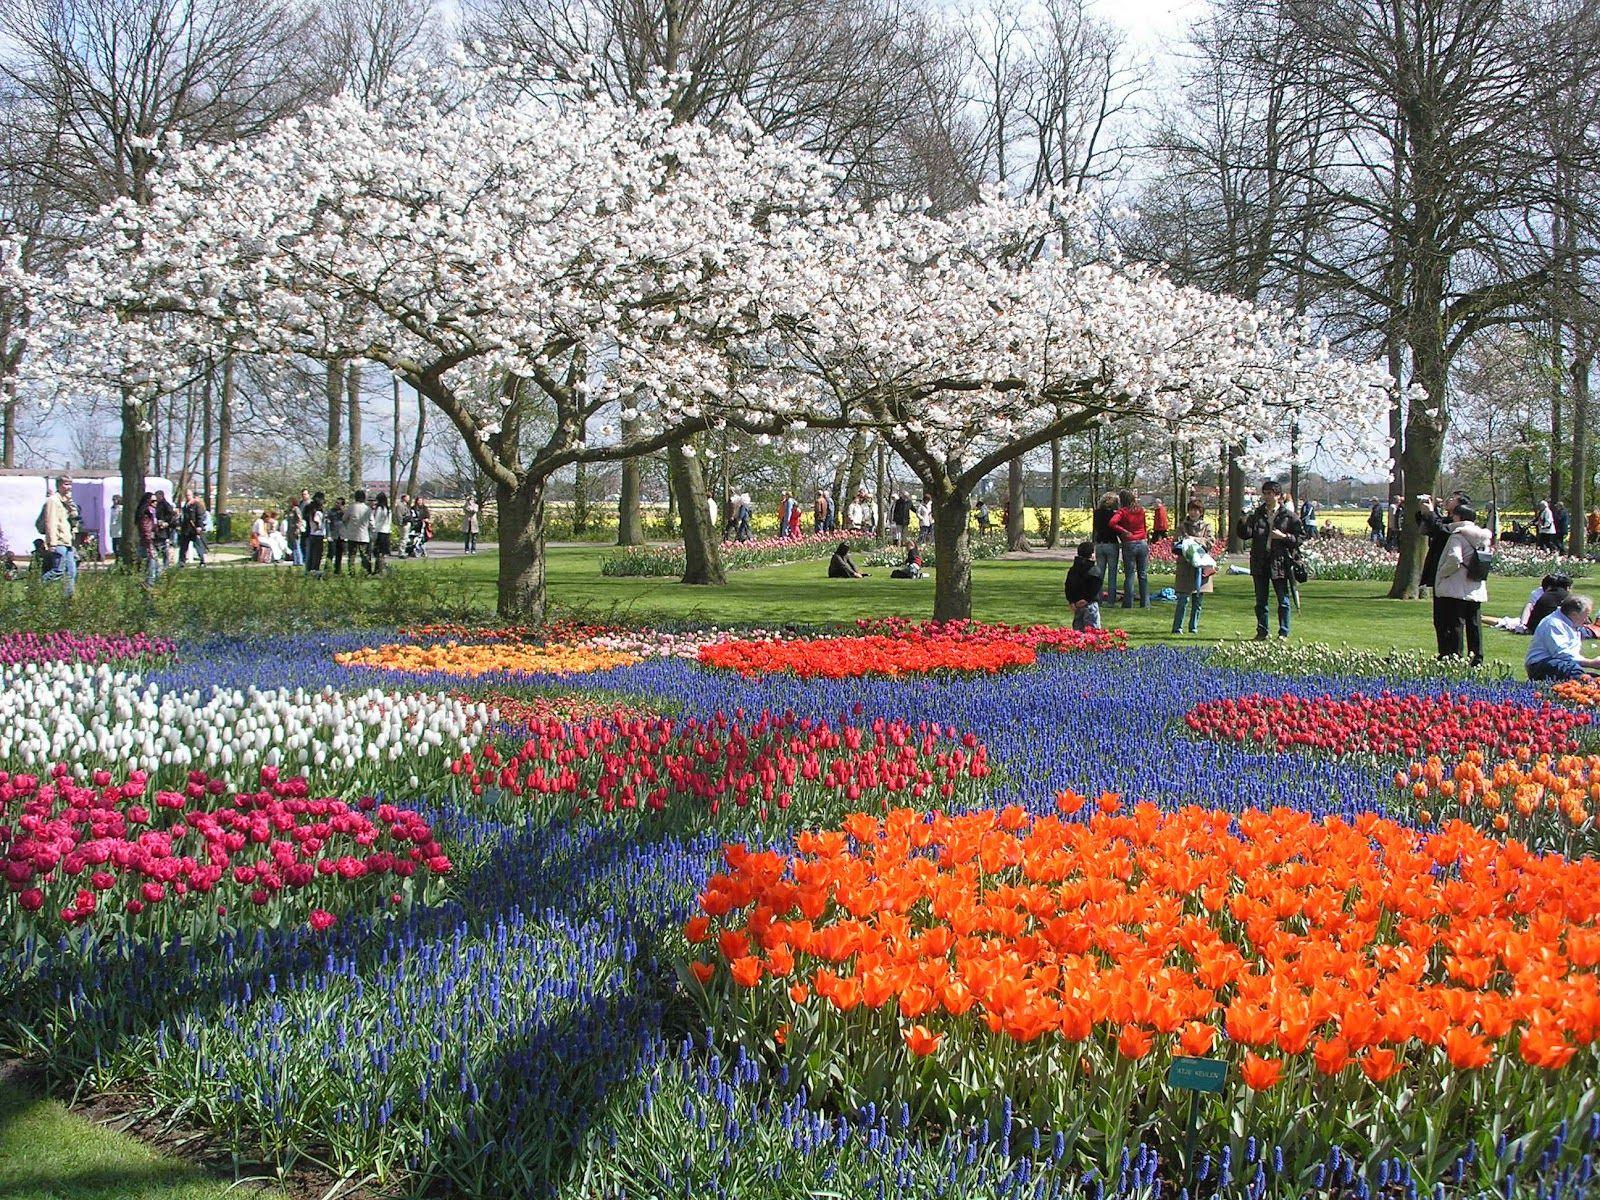 Jardín Keukenhof En Holanda Uno De Los Jardines Más Hermosos ... pour Jardin De Keukenhof